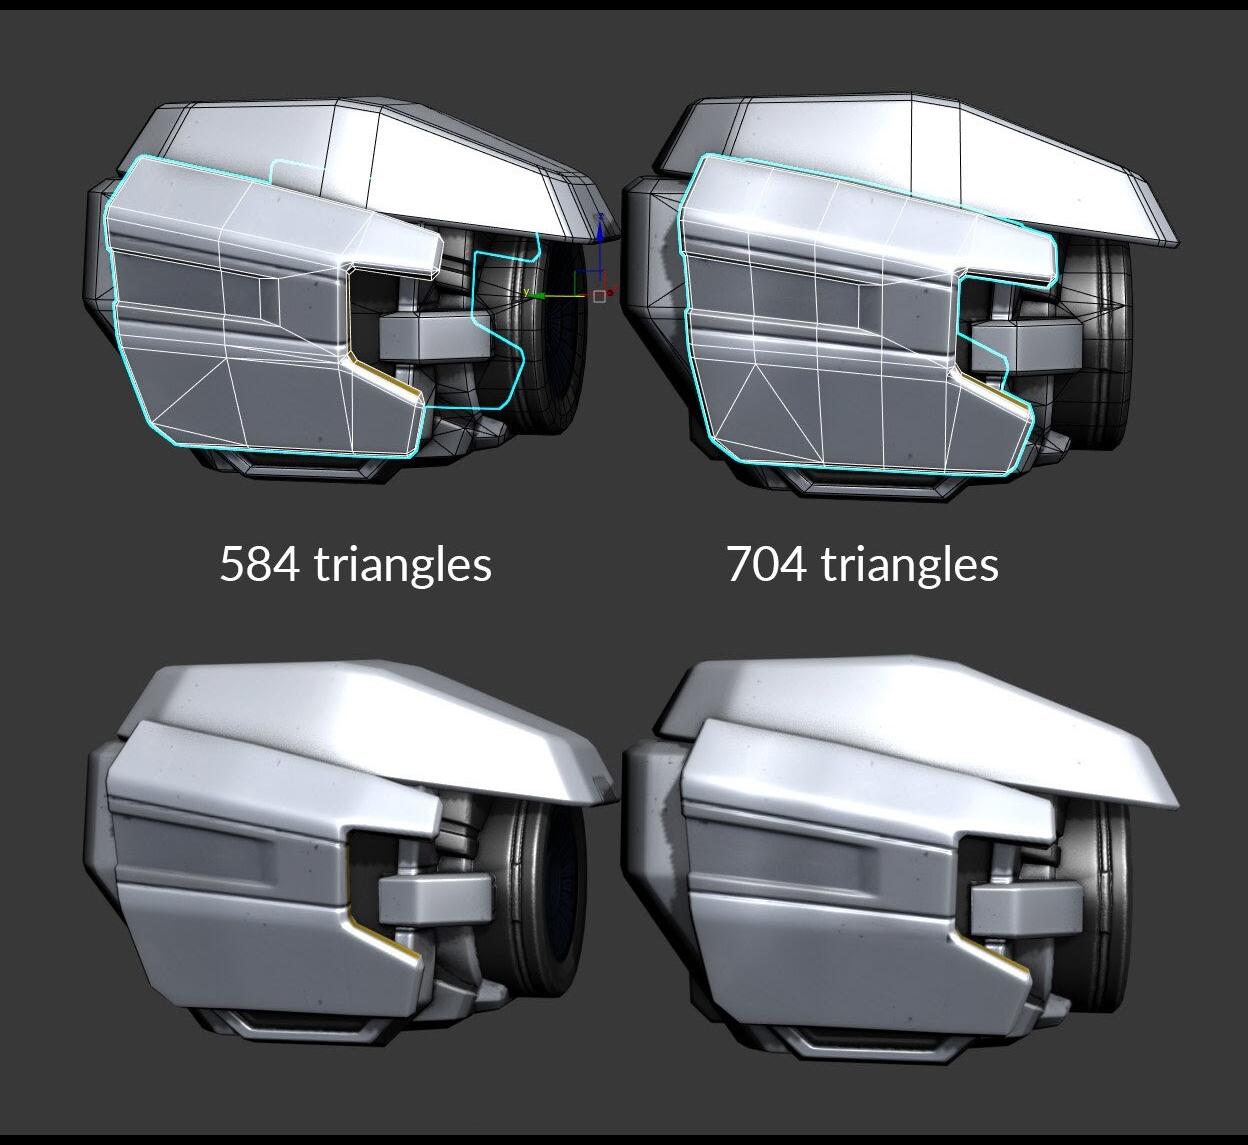 Objek di sebelah kiri memiliki 584 segitiga, sementara objek di sebelah kanan memiliki 704 segitiga.